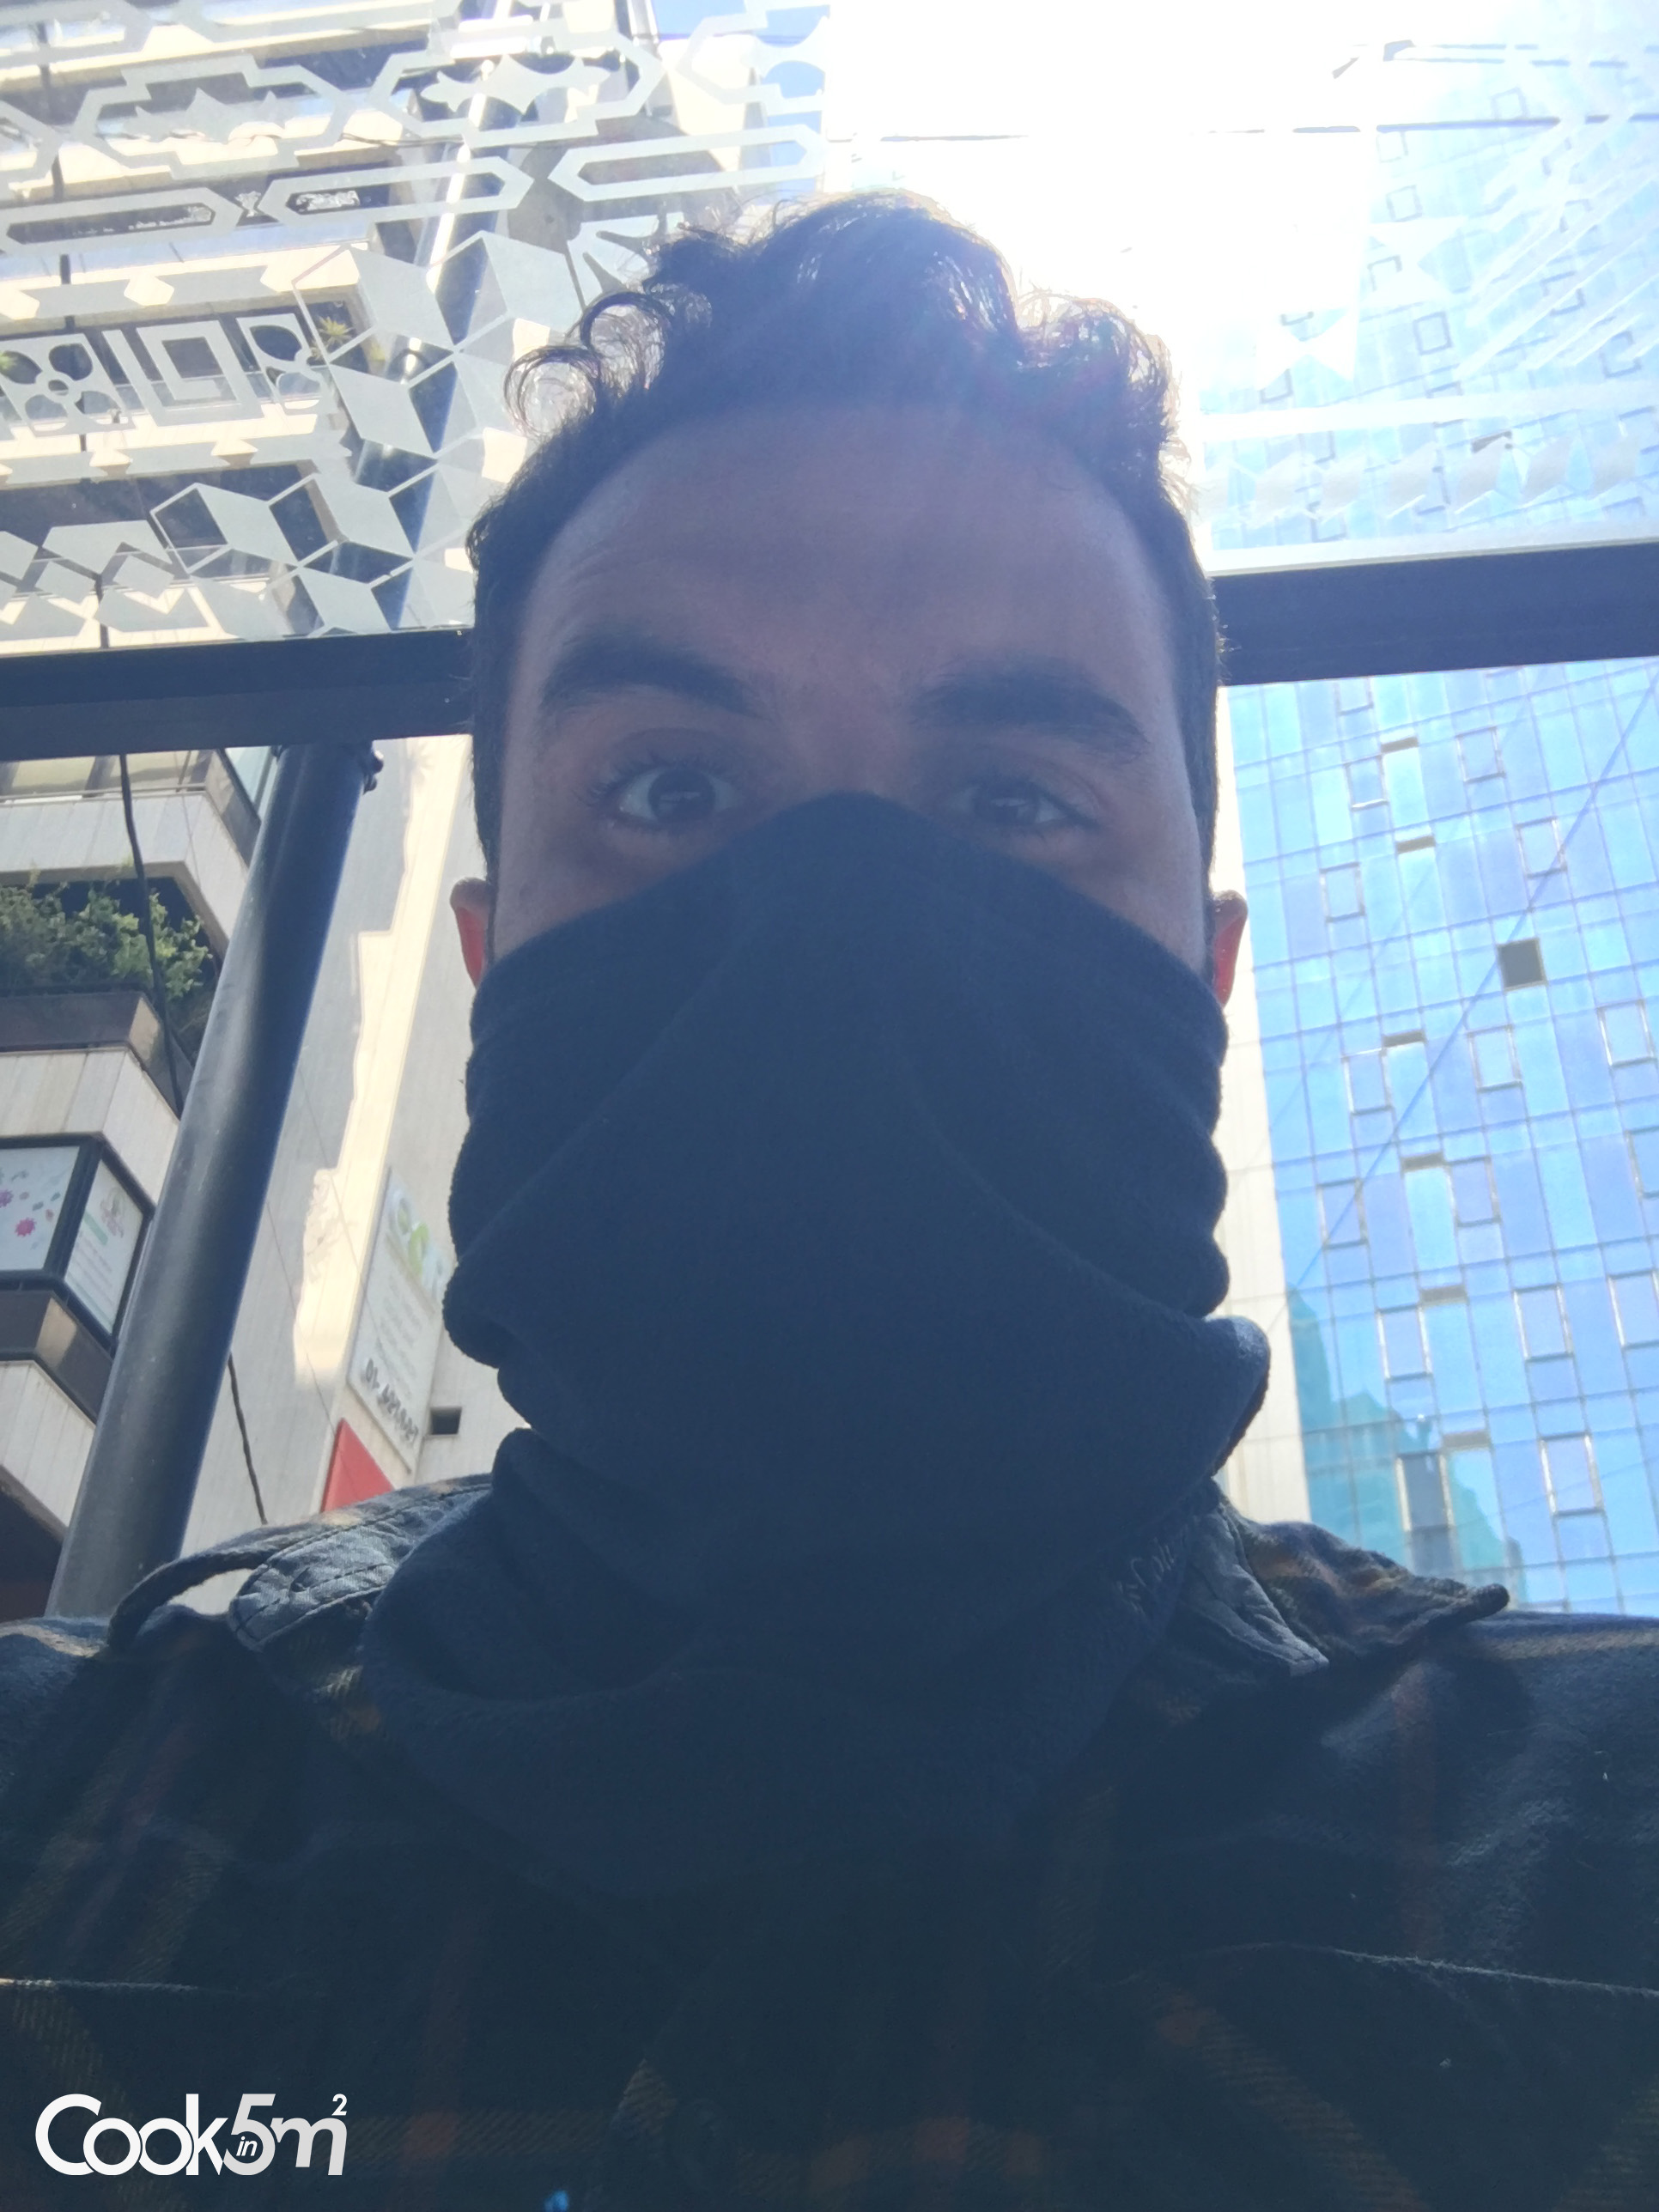 Mask hisham assaad coronavirus.jpeg